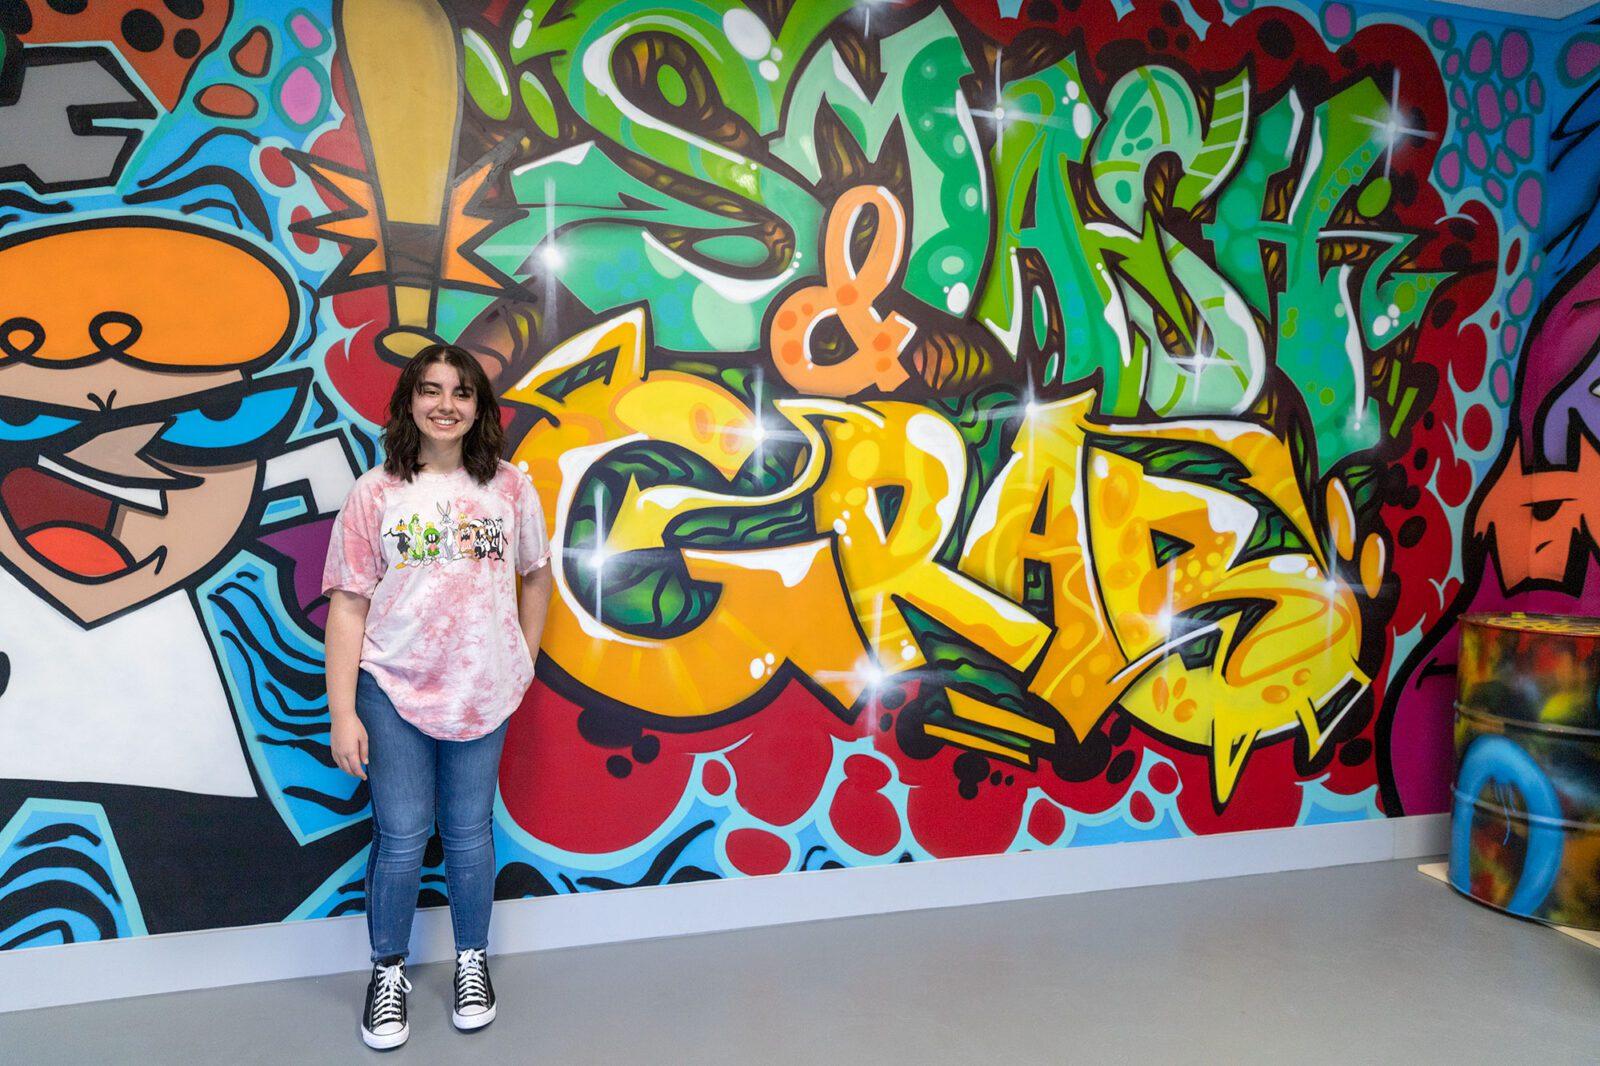 teenage girl standing near smash and grab mural